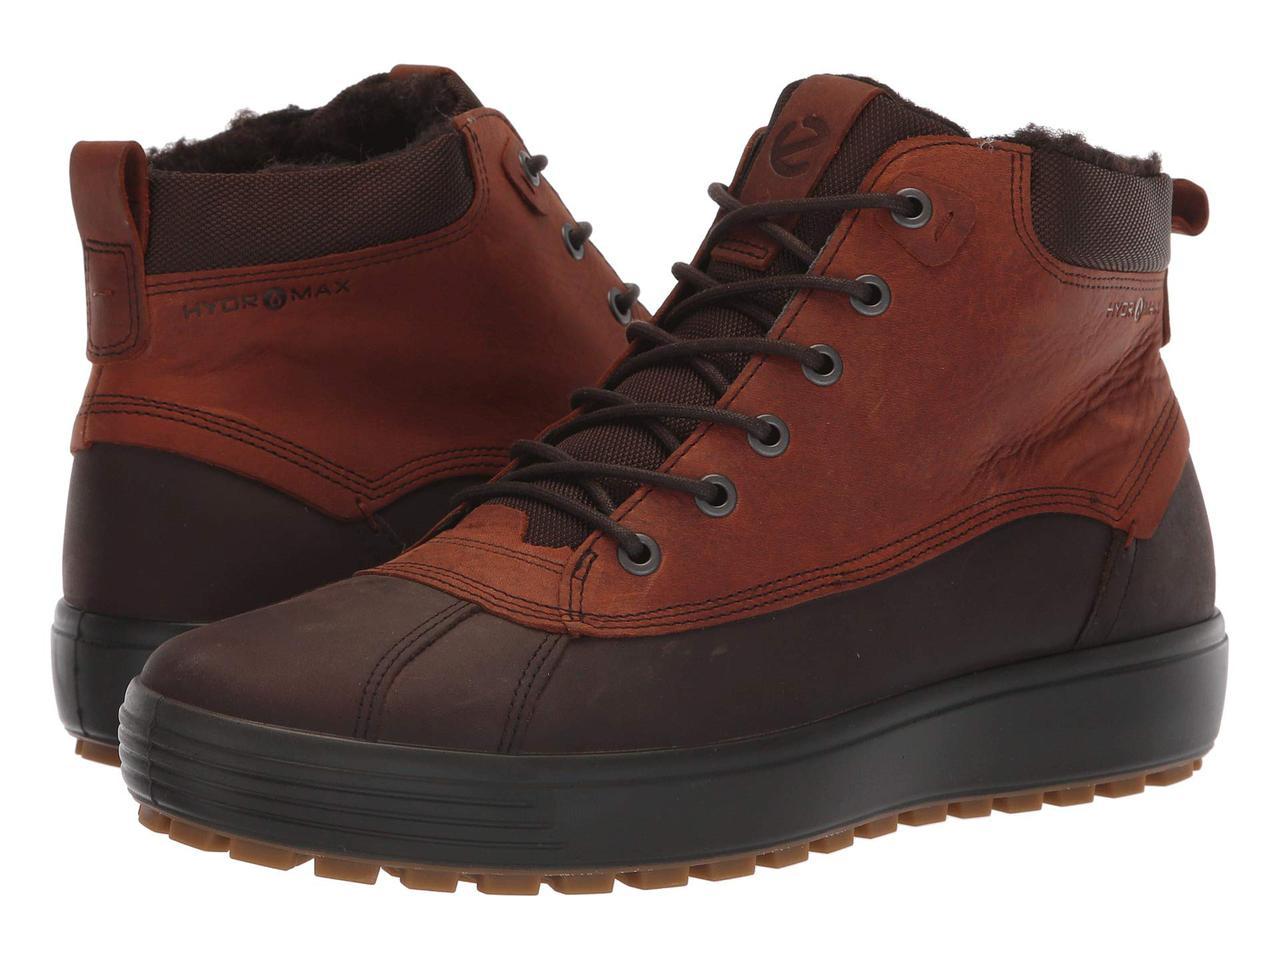 Ботинки Сапоги (Оригинал) ECCO Soft 7 Tred Hydromax High Mocha Cognac 89d86e5160b8e